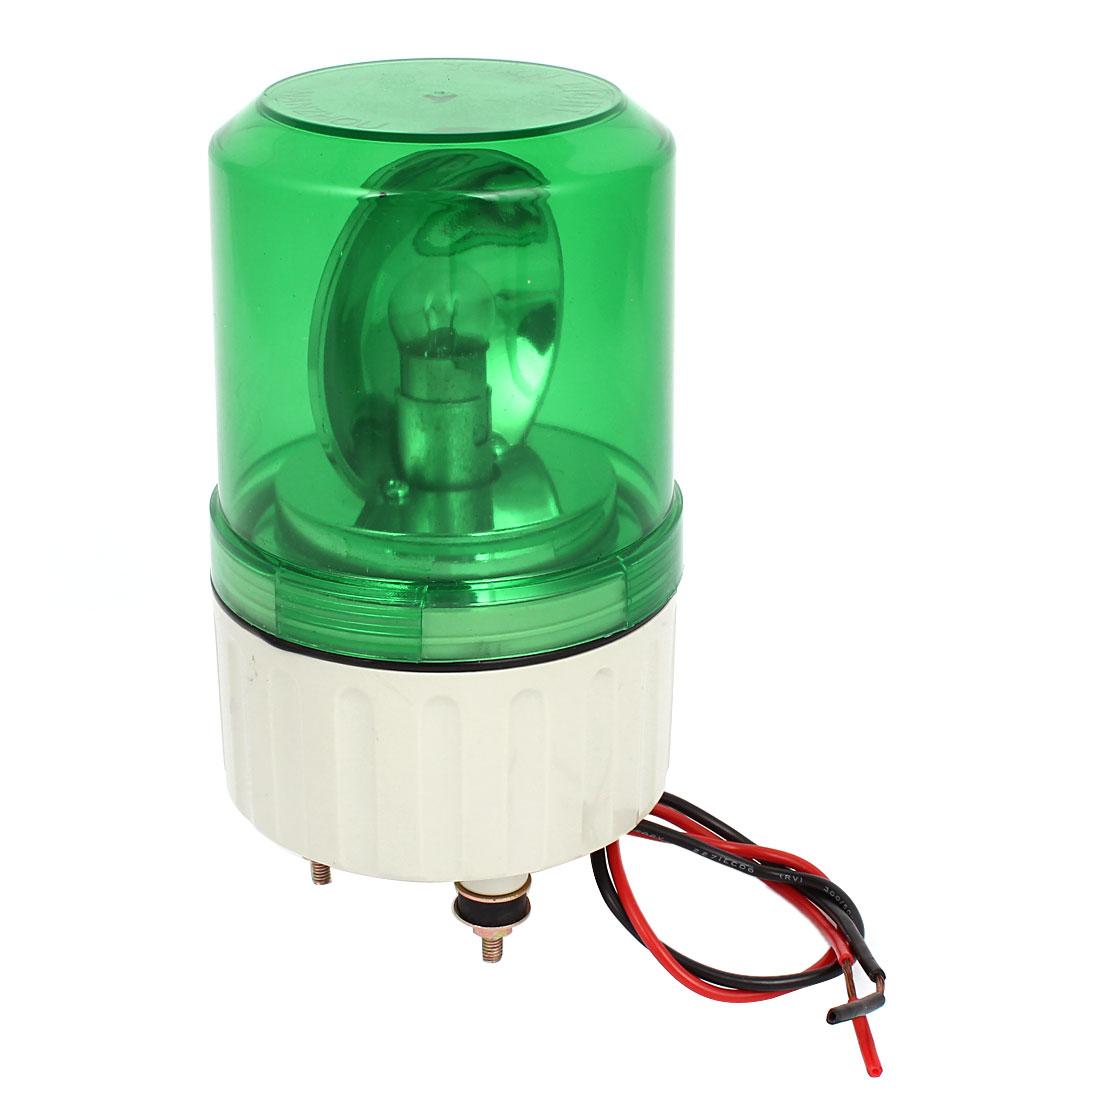 DC 24V Green Rotating Industrial Signal Warning Light Lamp Bulb